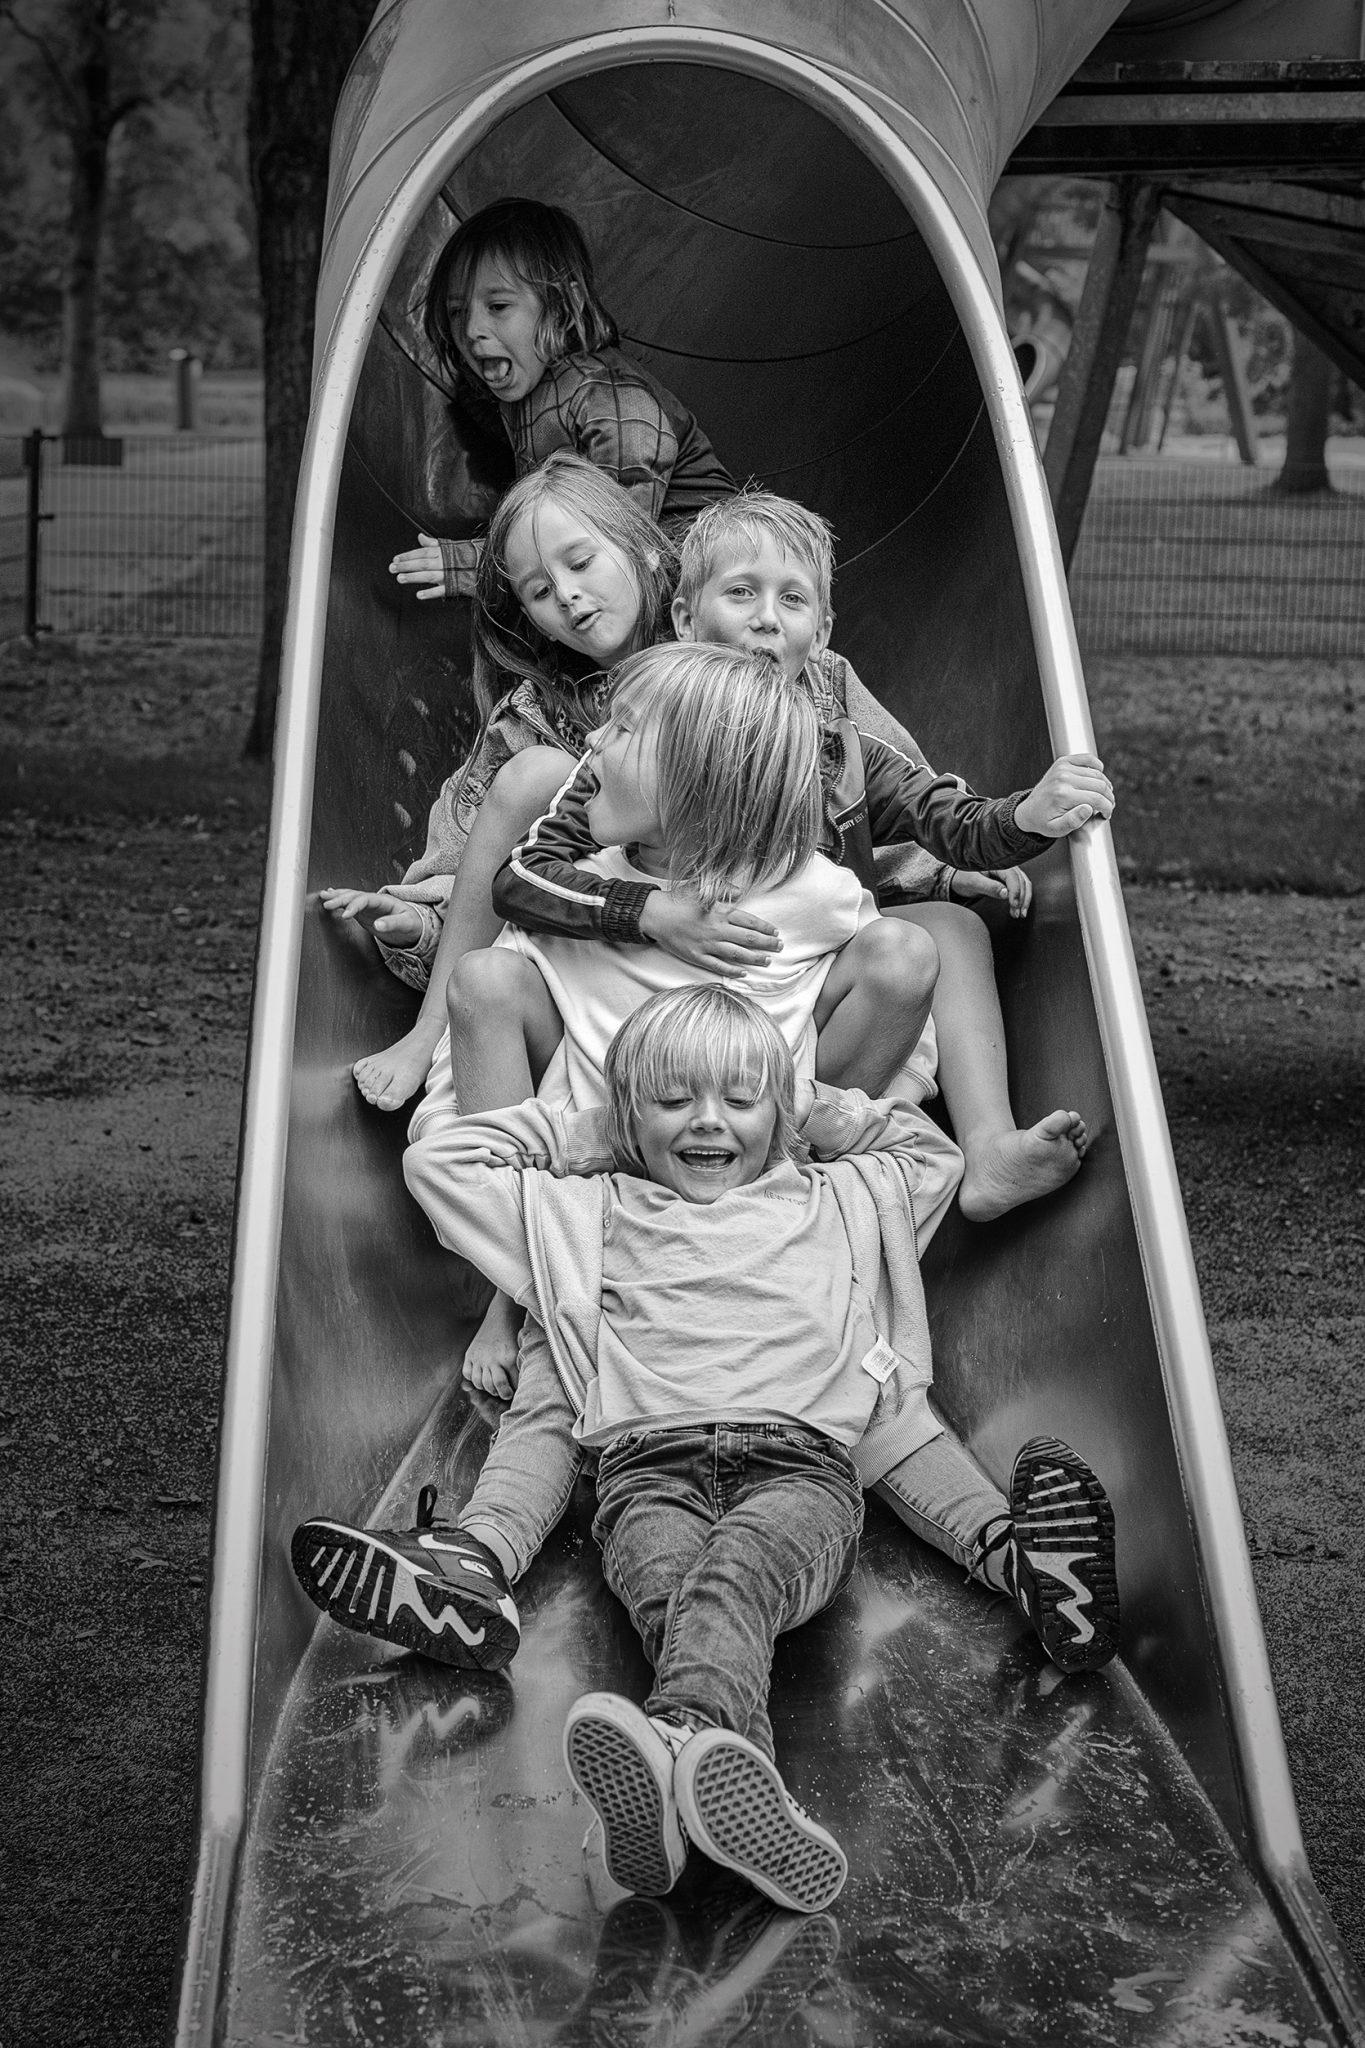 Kids - fine art photography